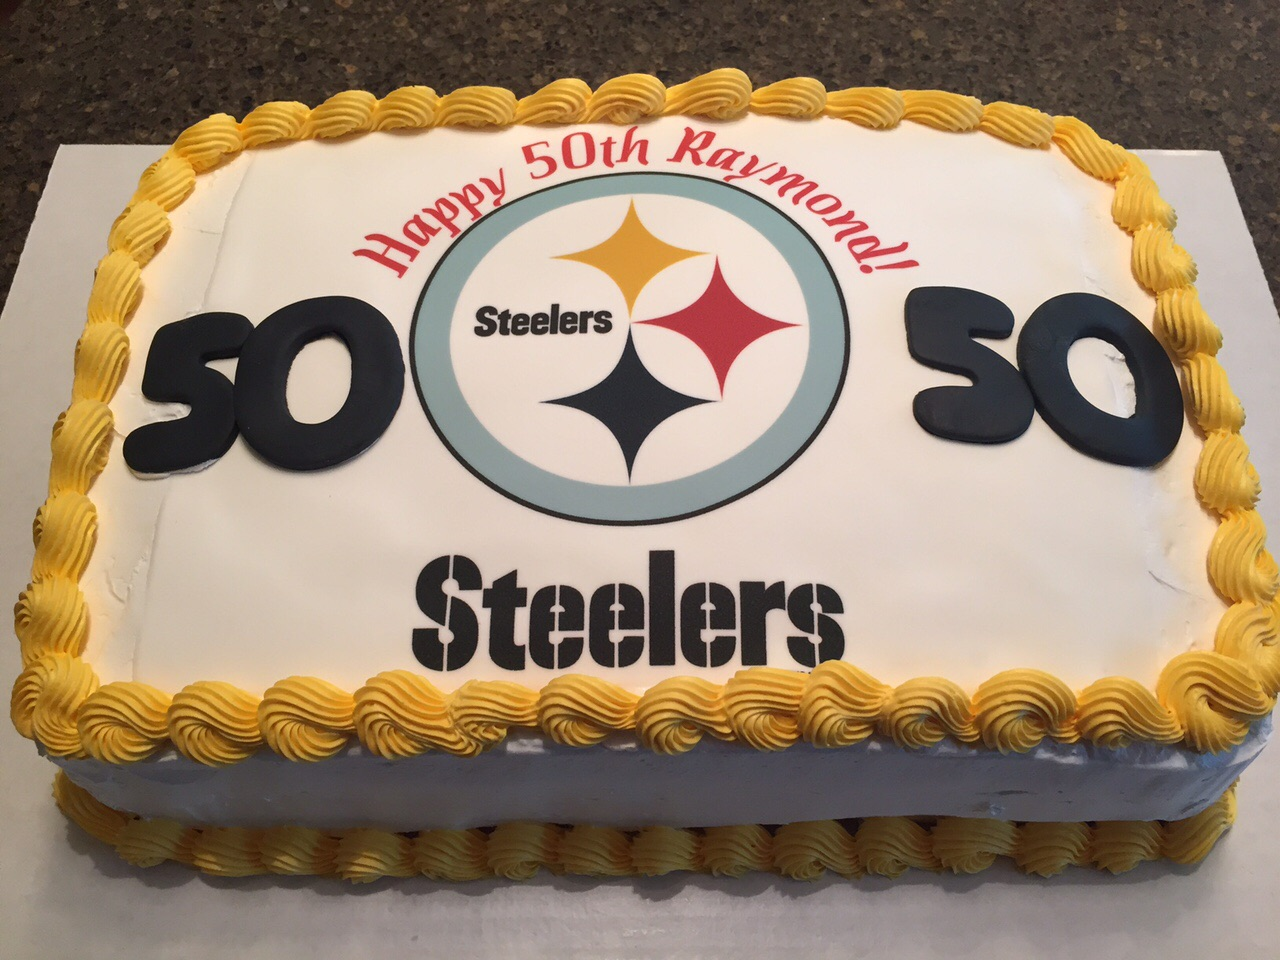 Steelers 50th birthday cake